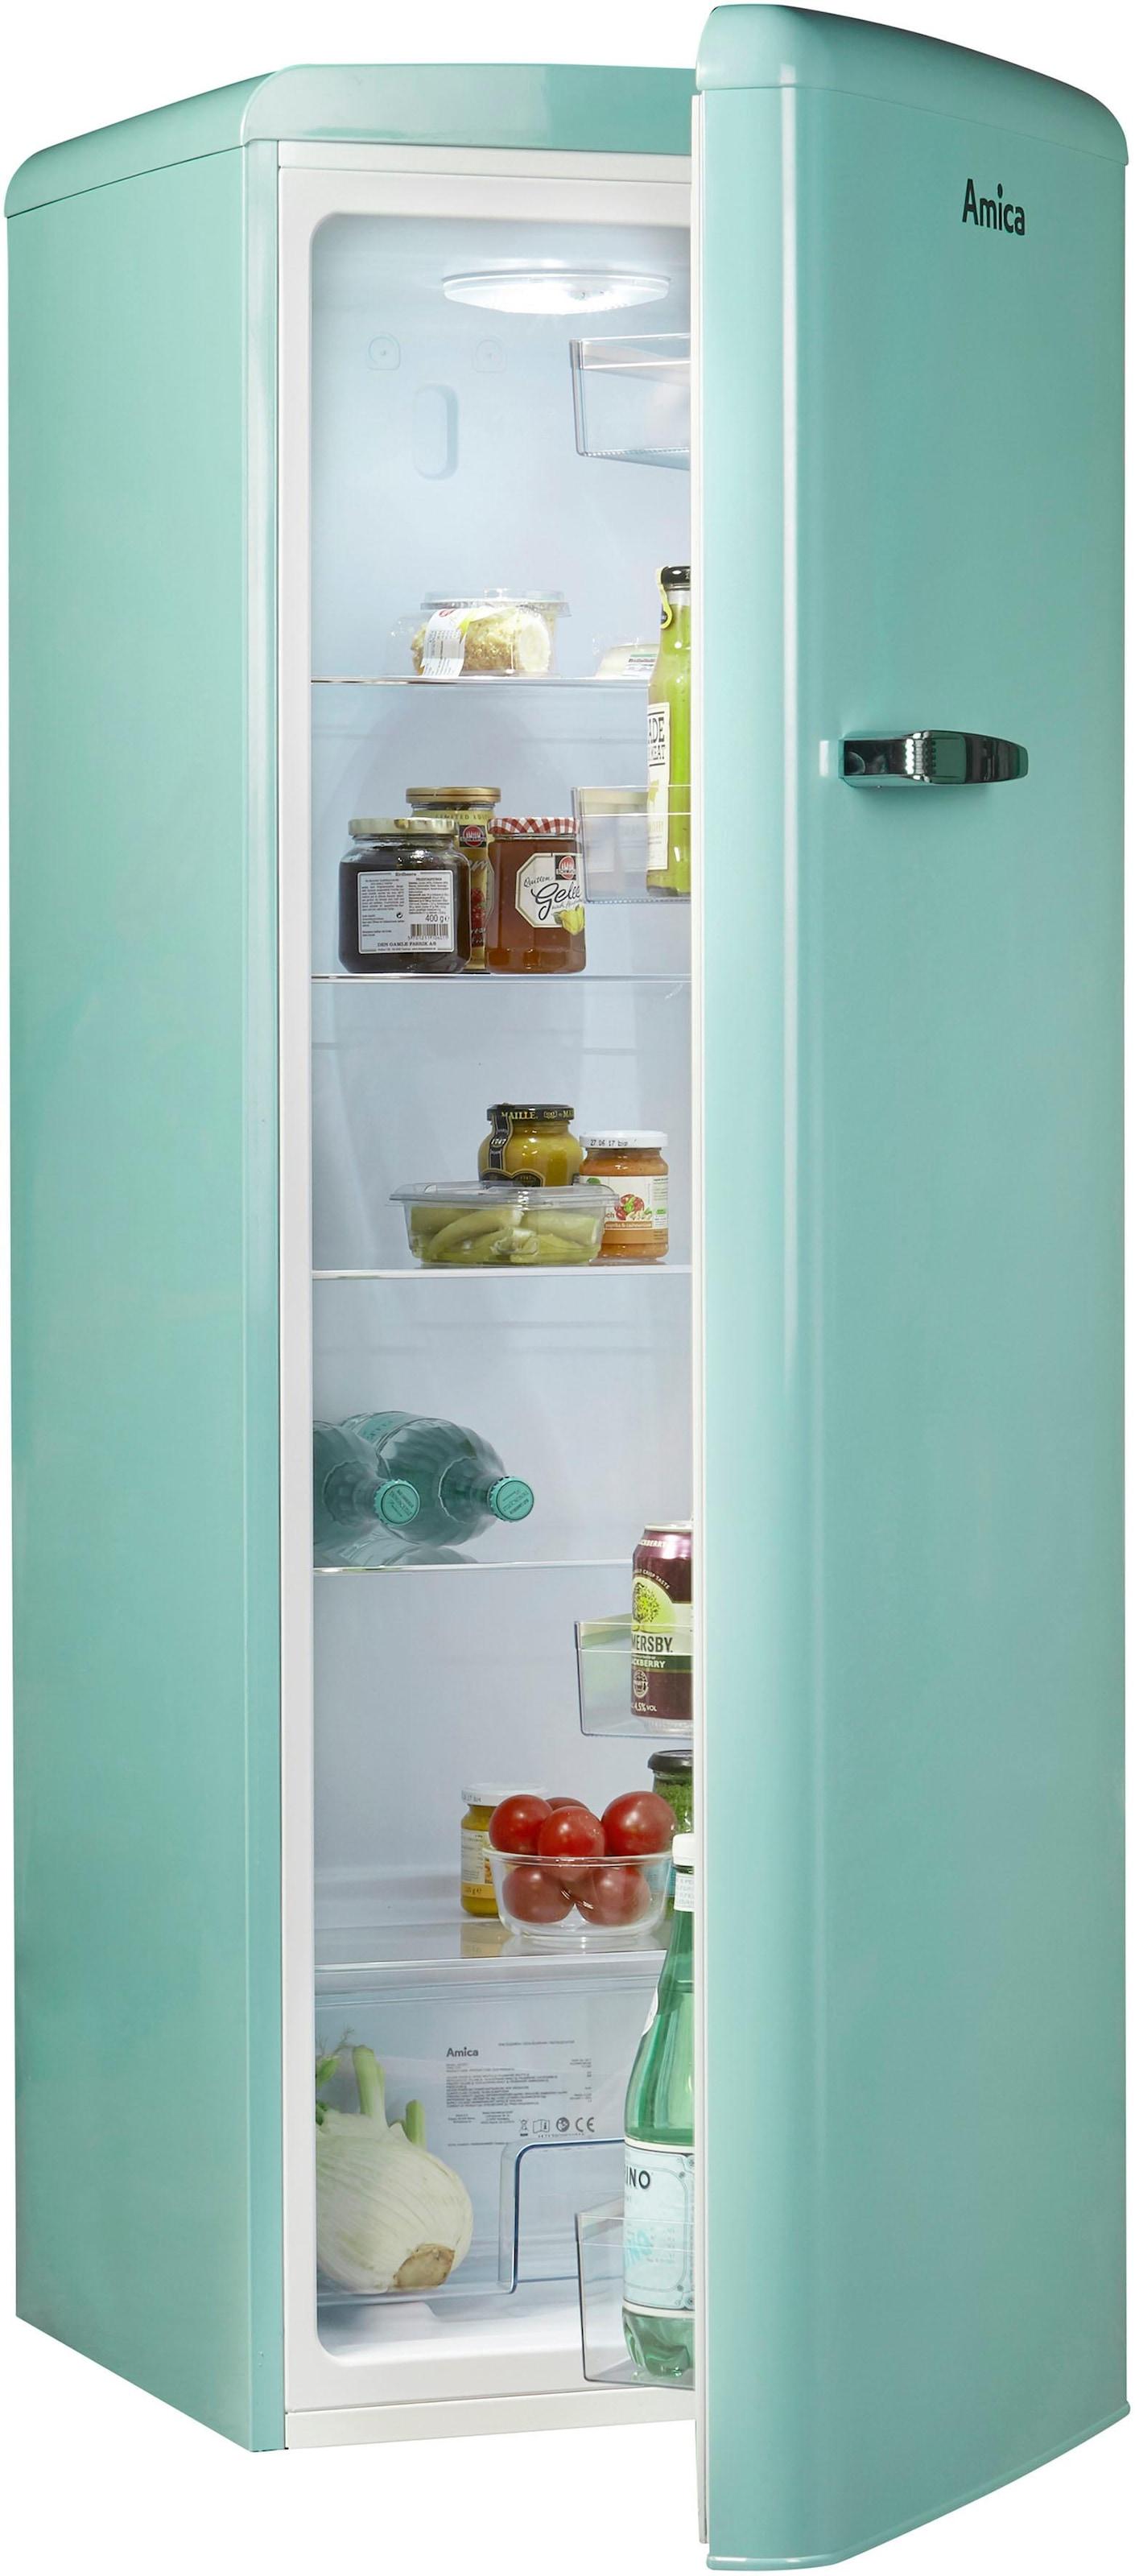 Amica Kühlschrank : Amica kühlschrank cm hoch cm breit baur